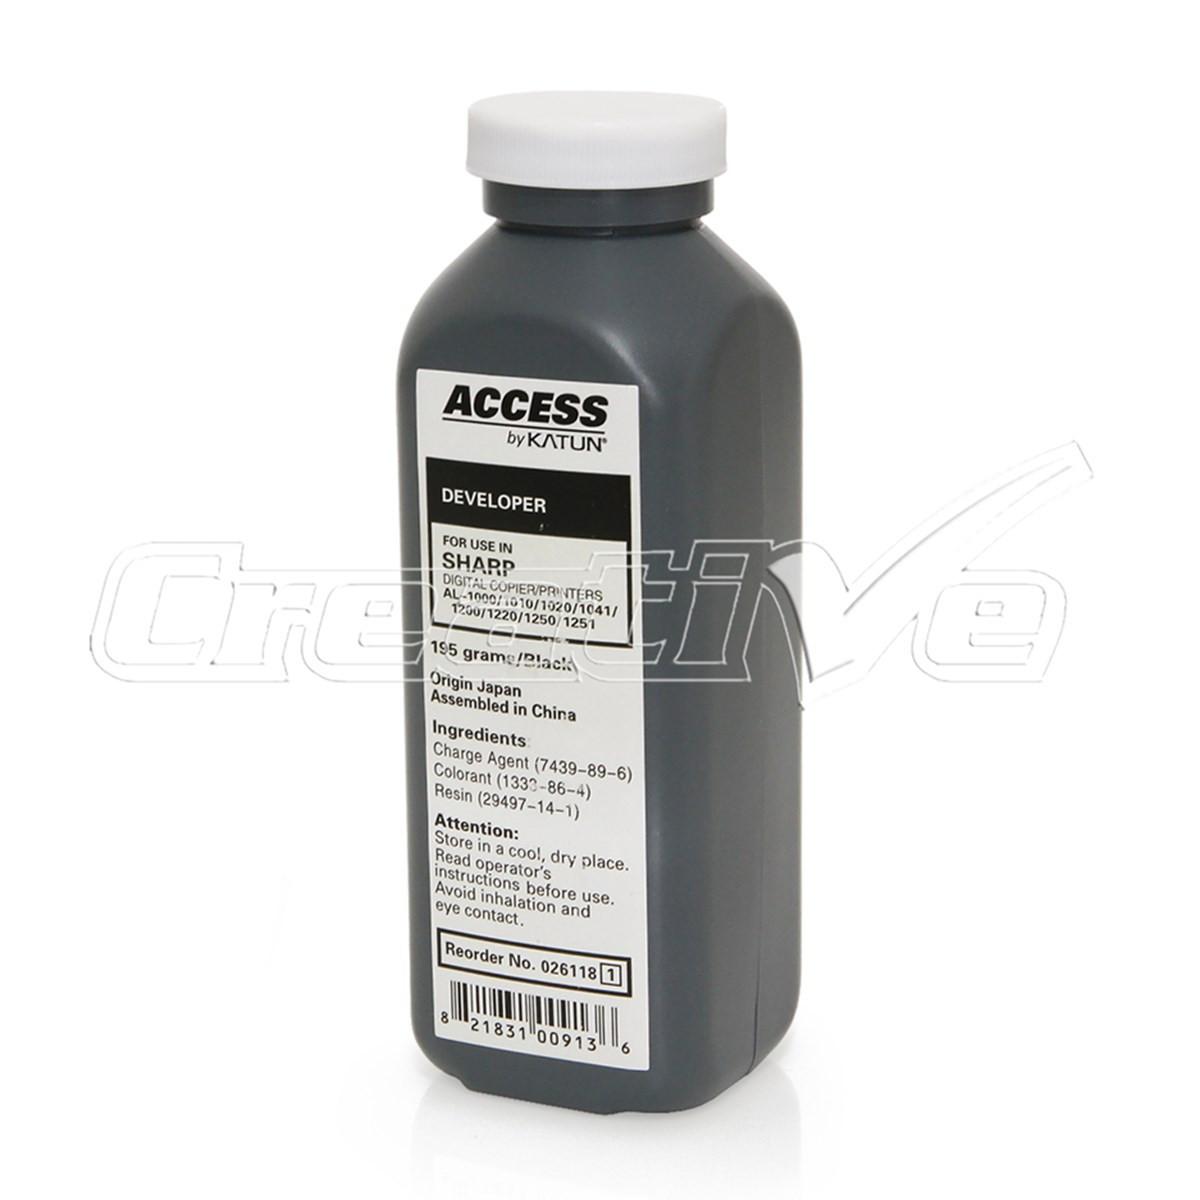 Revelador Xerox XD100 XD105 XL2120 XL2130 | 195g | Katun Access